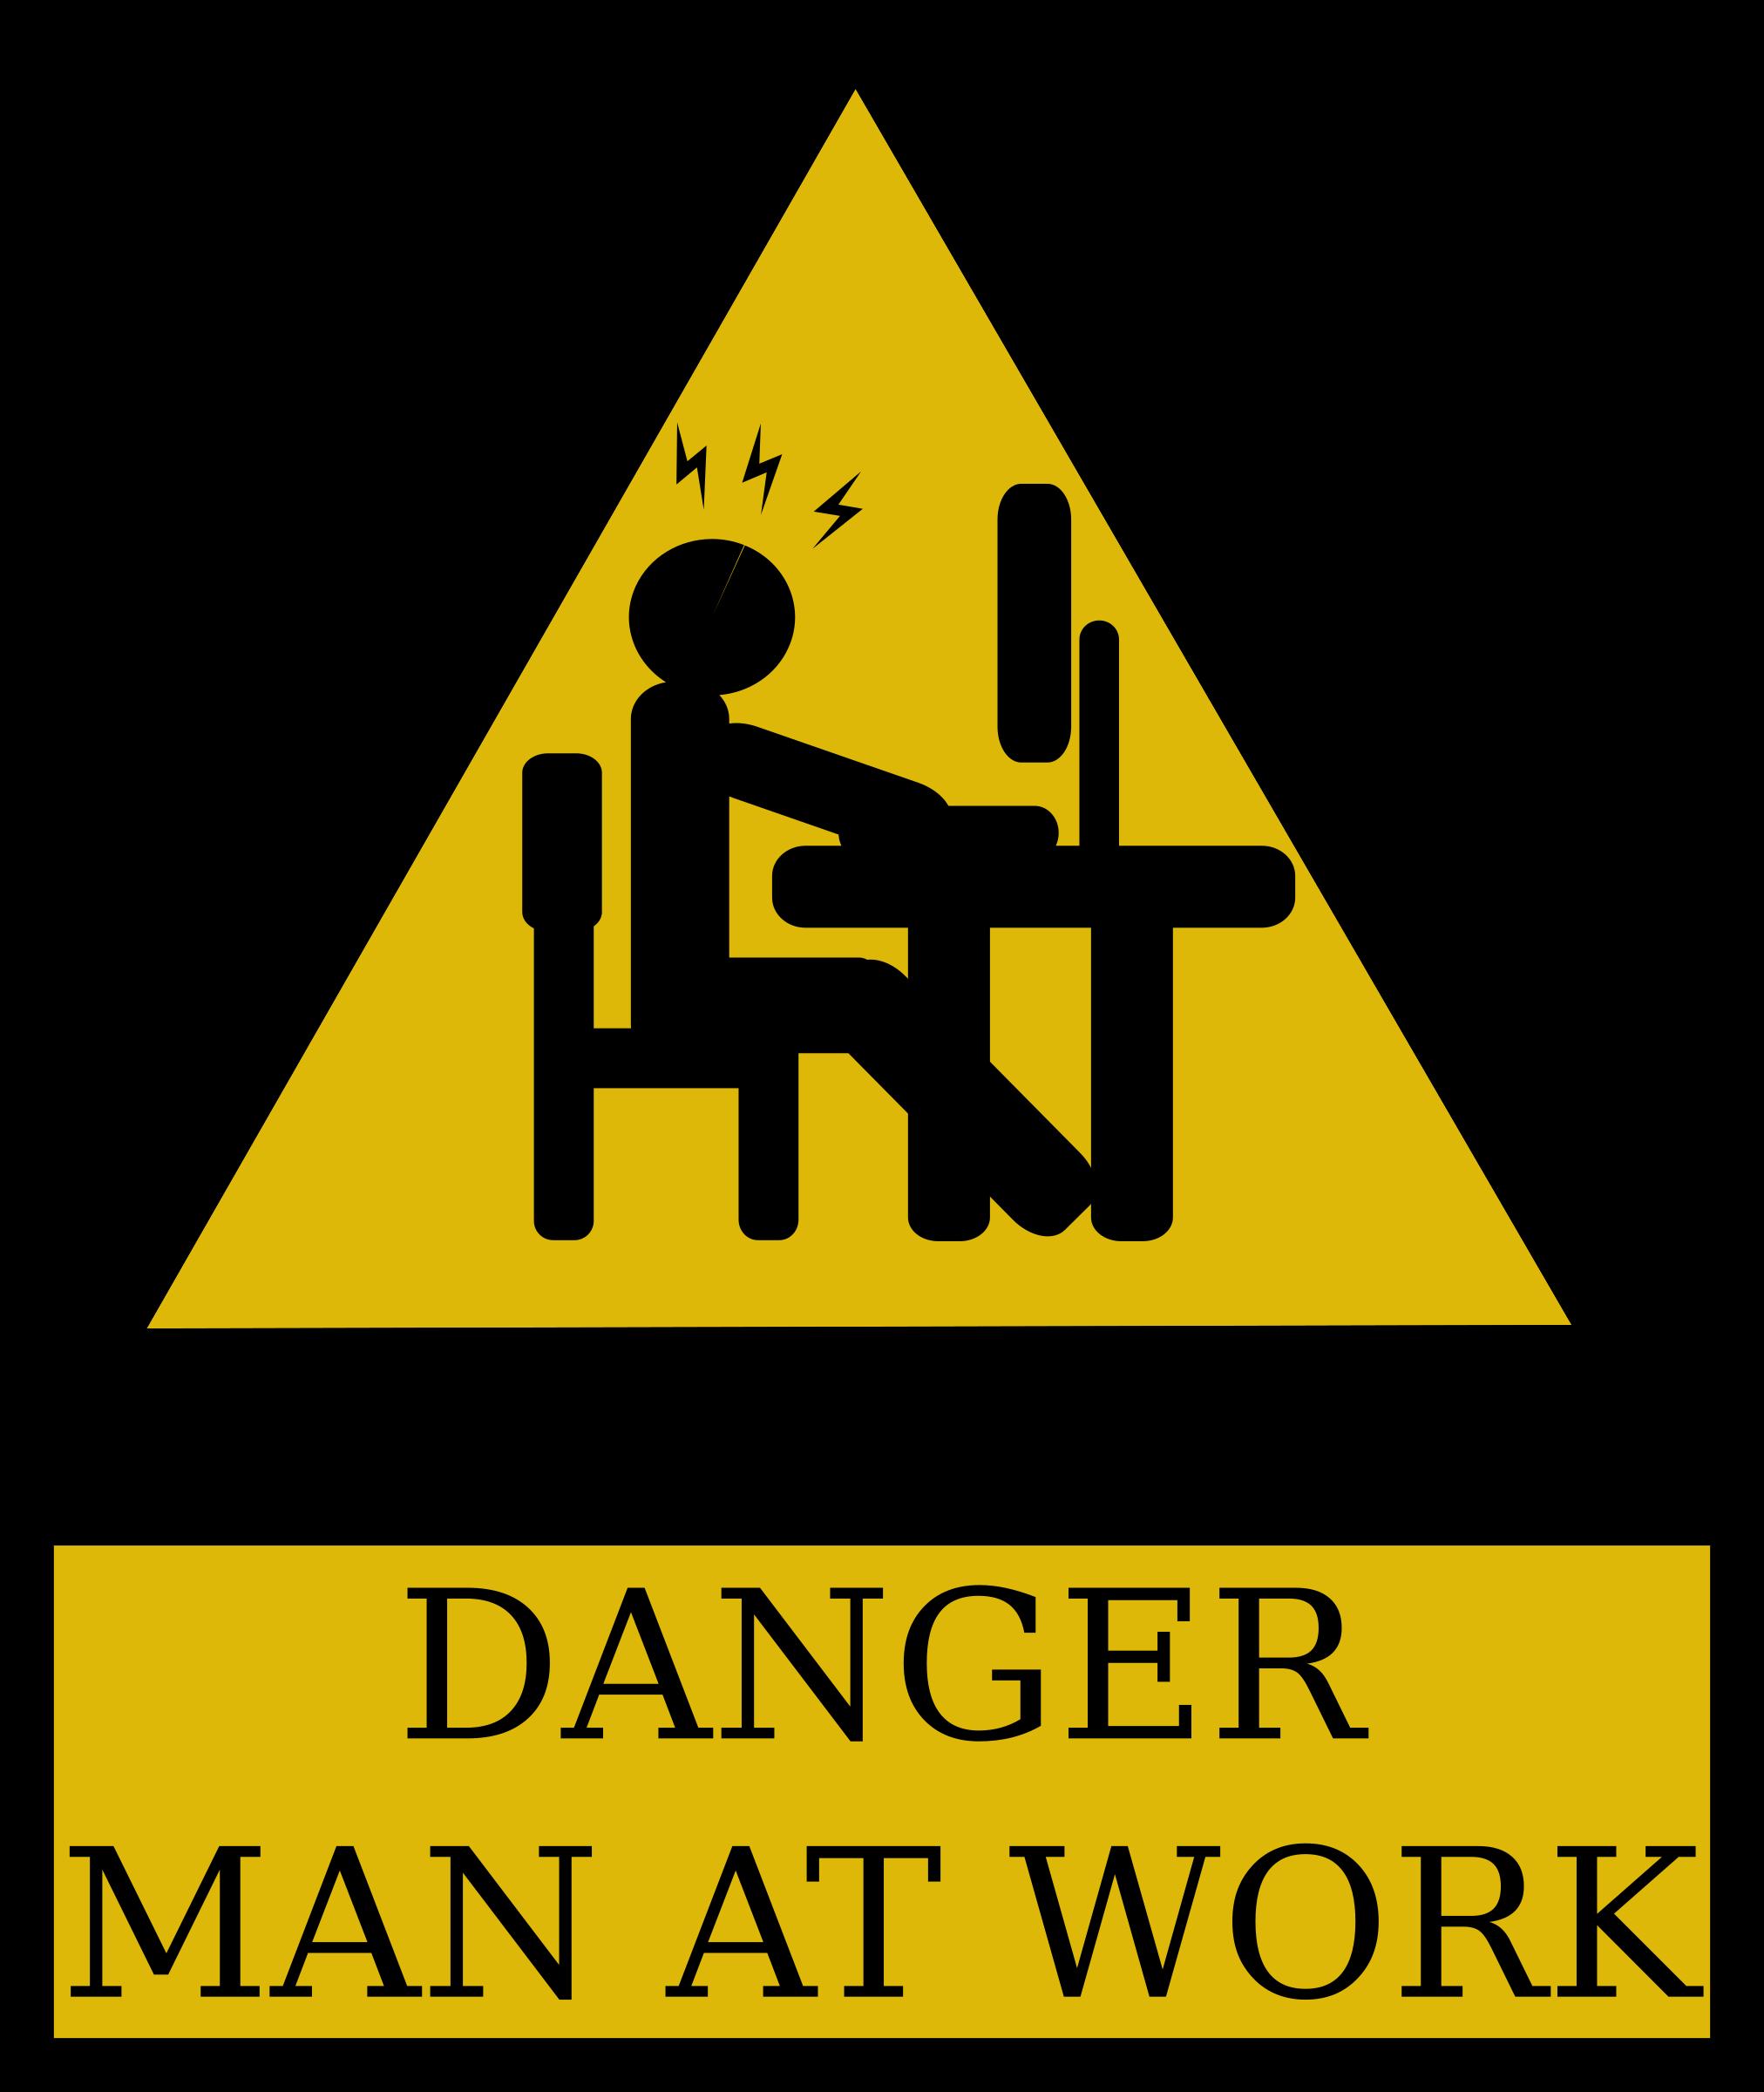 Programmer big image png. Working clipart work order